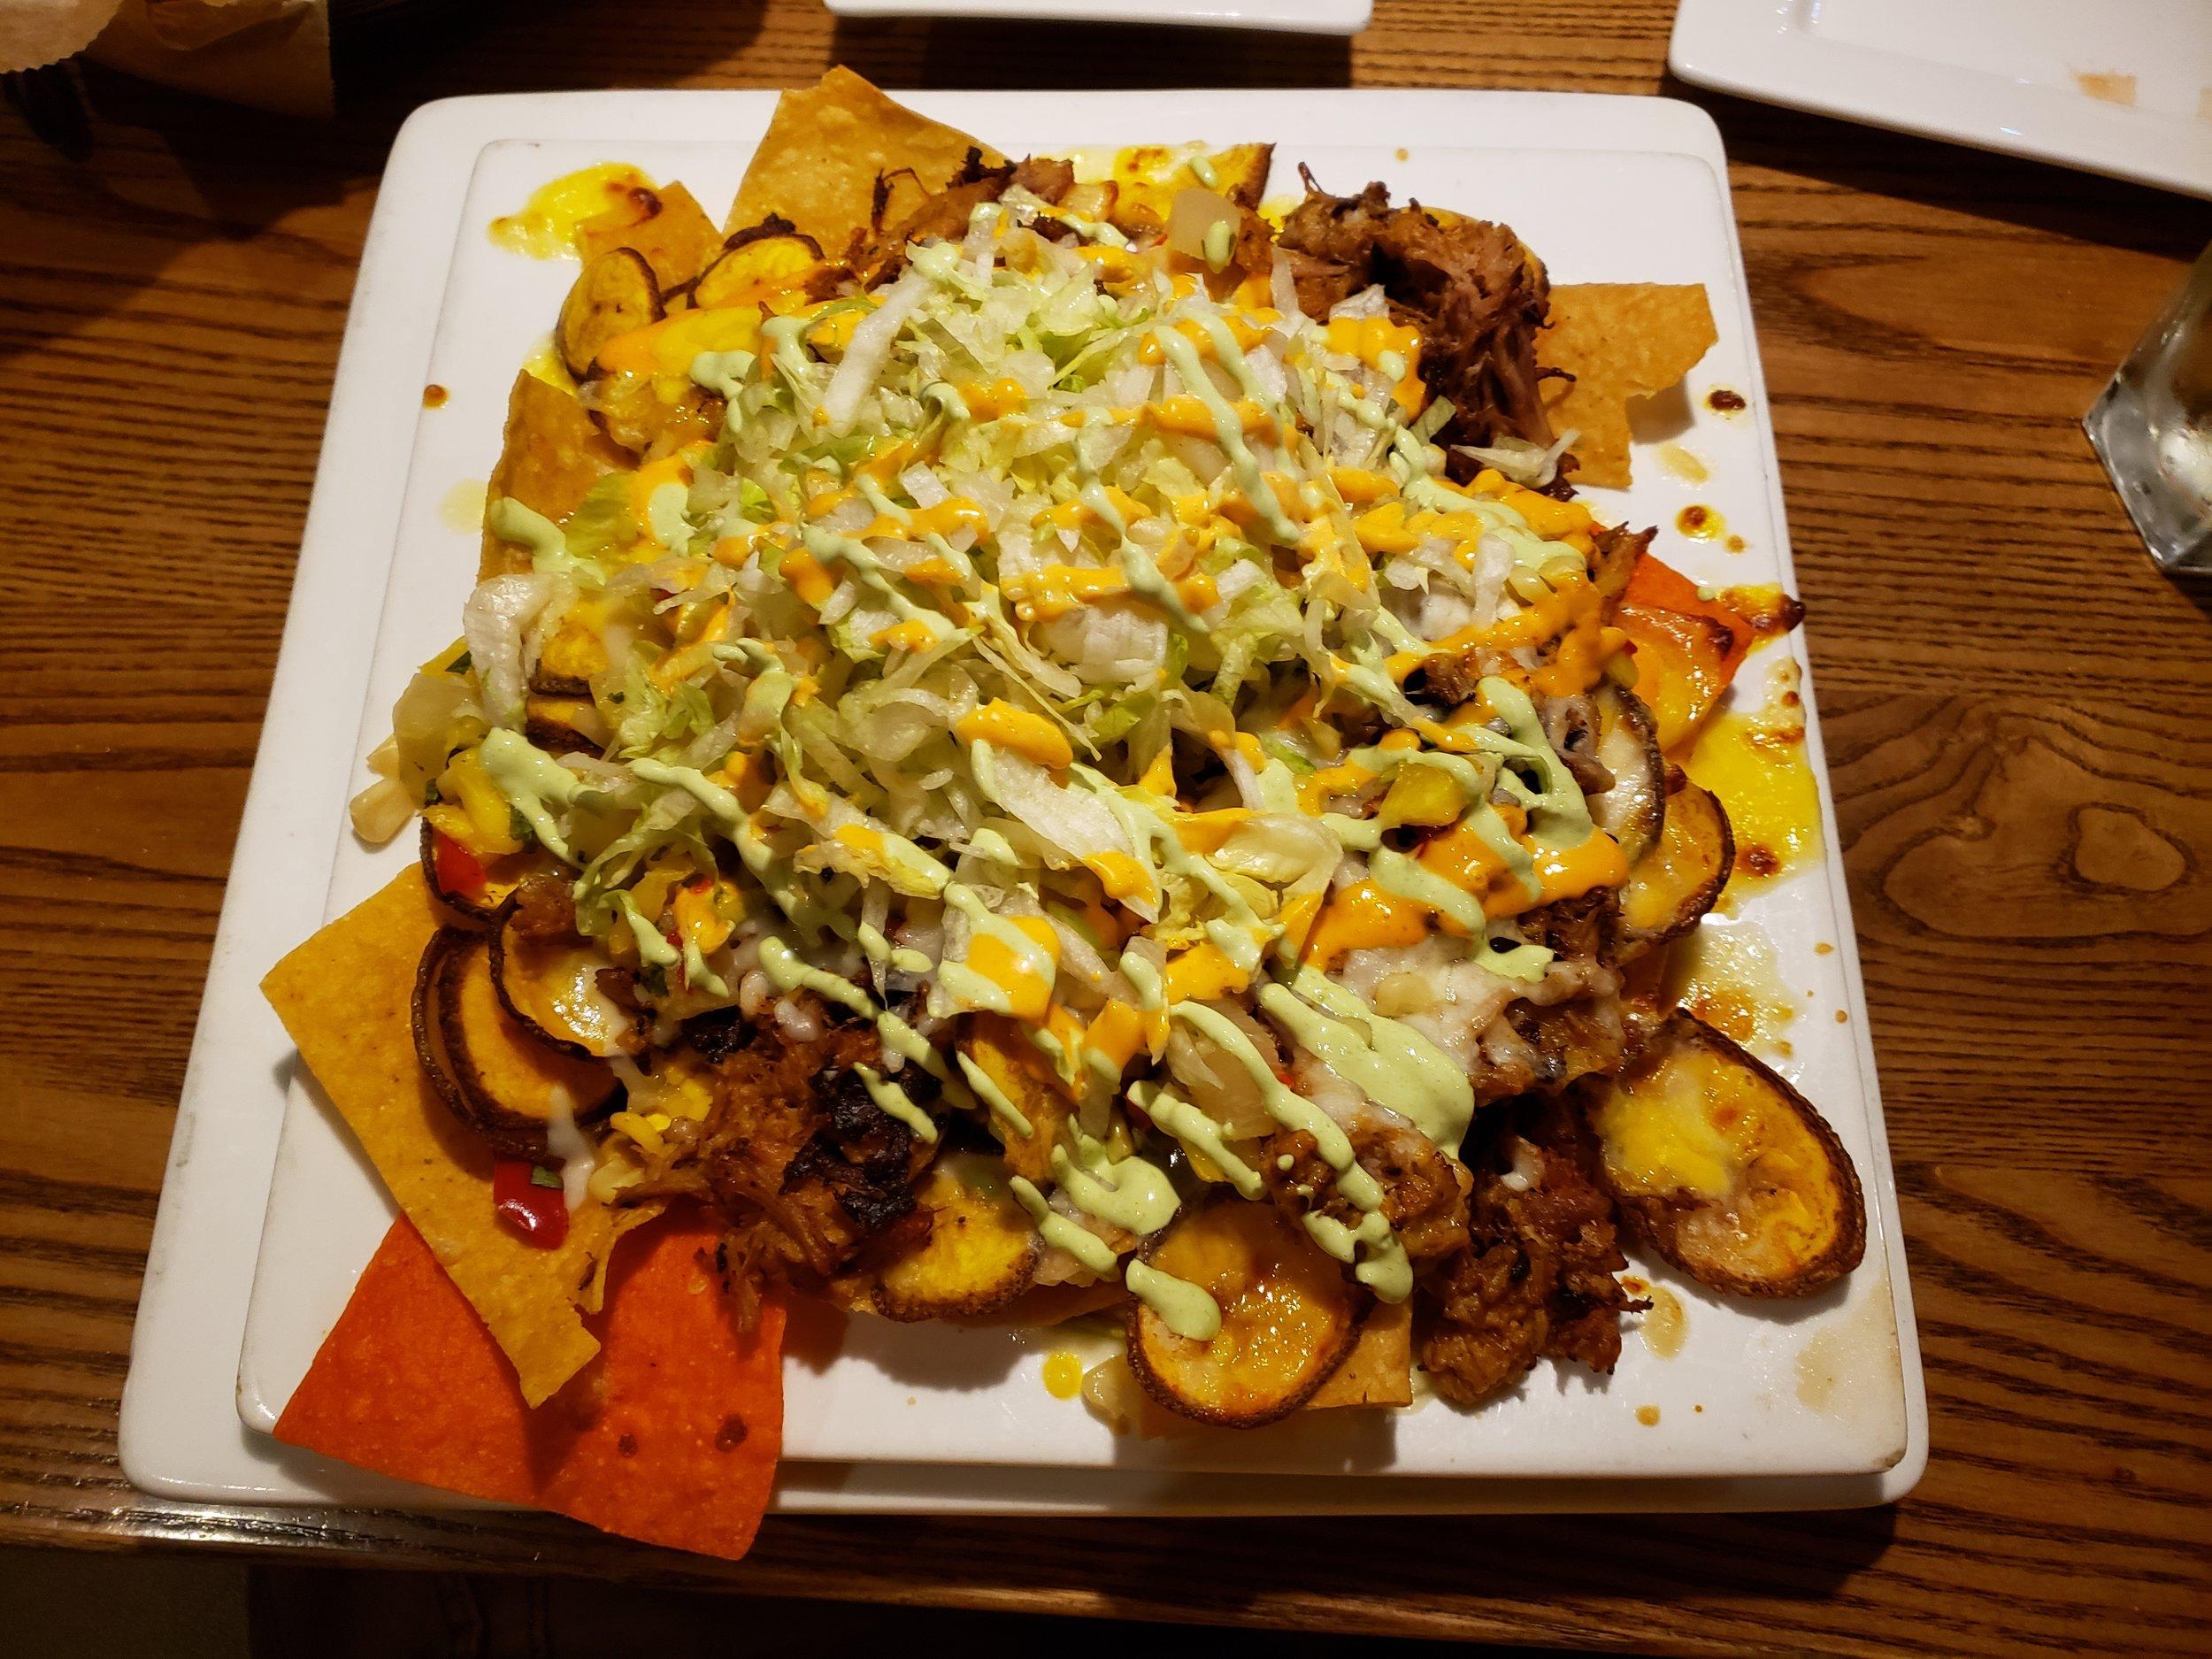 Barbacoa Pork, Pineapple Salsa, Plantain Chips, Chipotle BBQ, Jack Cheese, Lettuce, Cilantro Crema, Sriracha Aioli